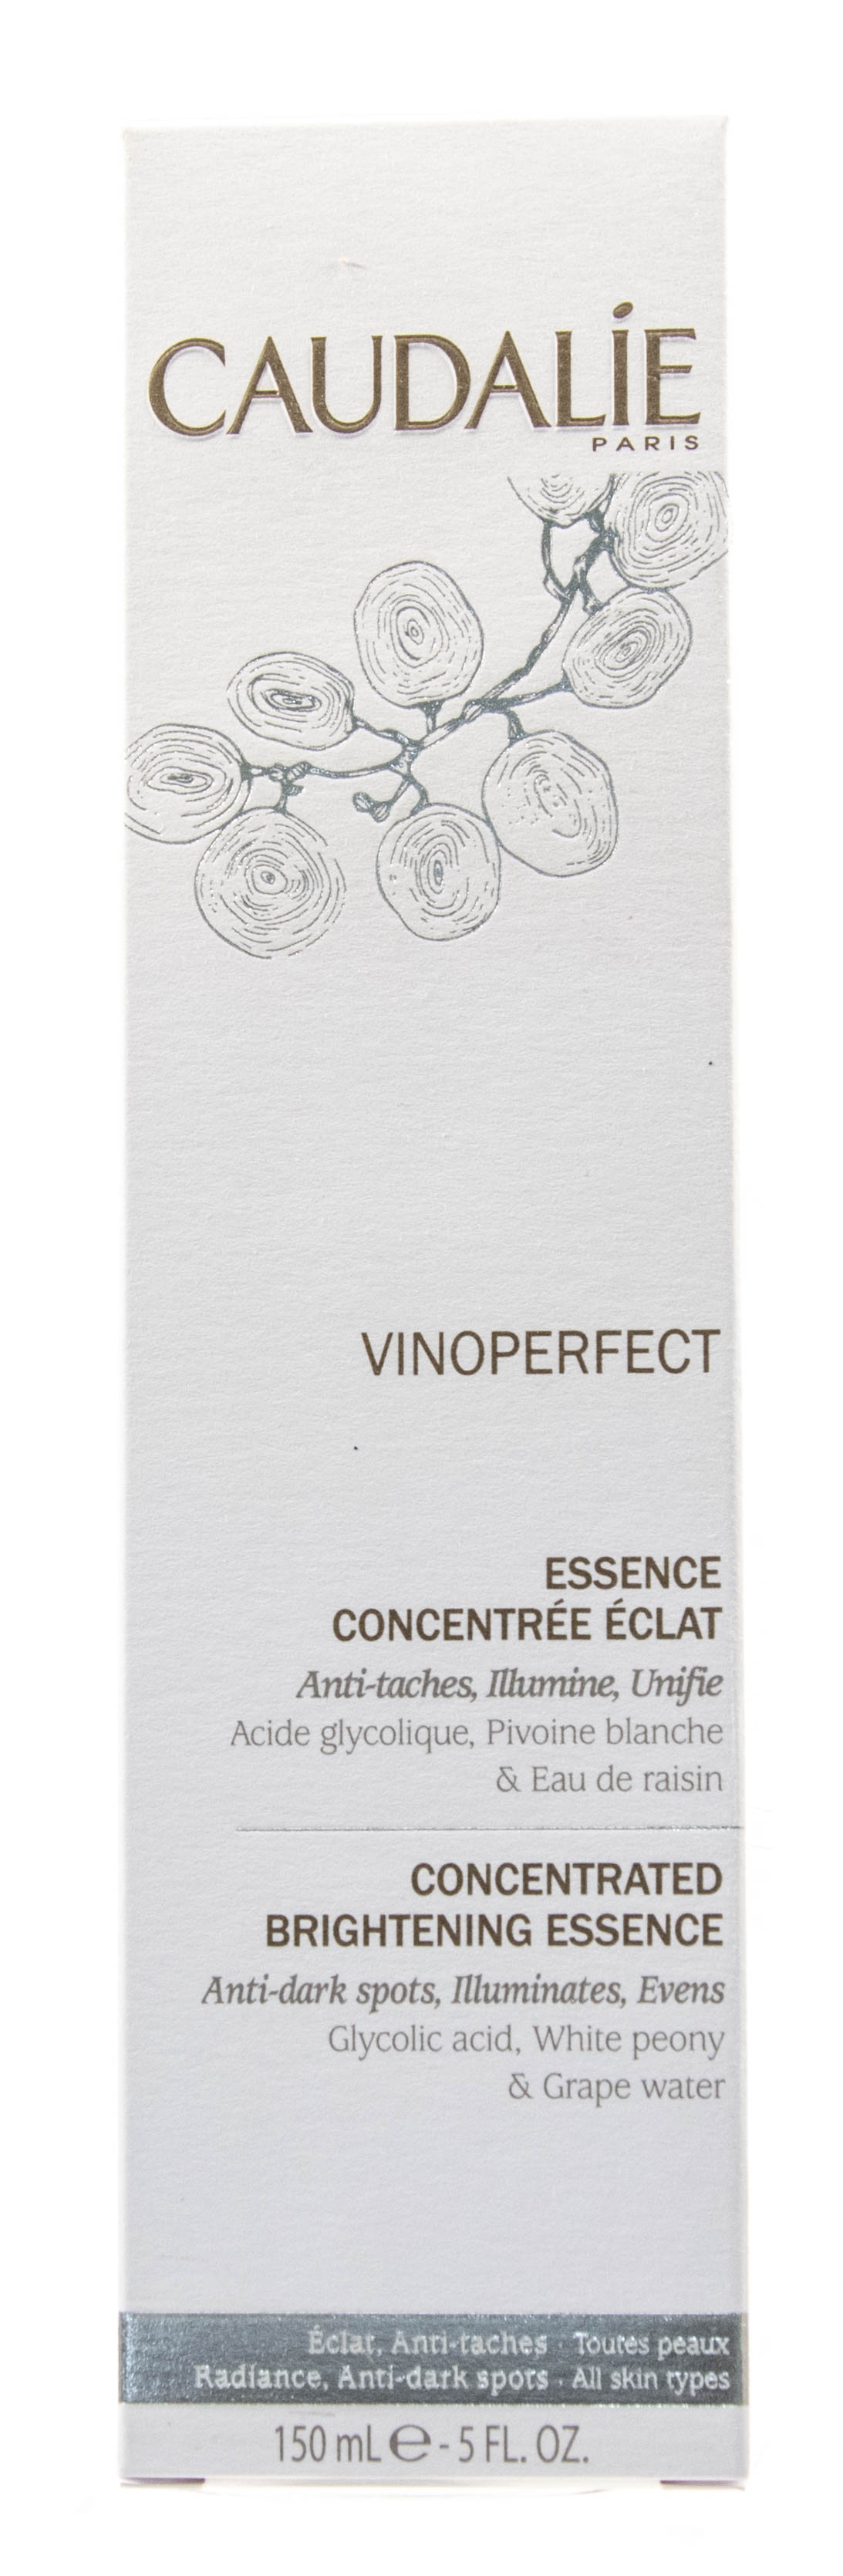 Эссенцияконцентрат для сияния кожи Виноперфект 150 мл (Caudalie, Vinoperfect) caudalie эссенция концентрат для сияния кожи vinoperfect 150 мл